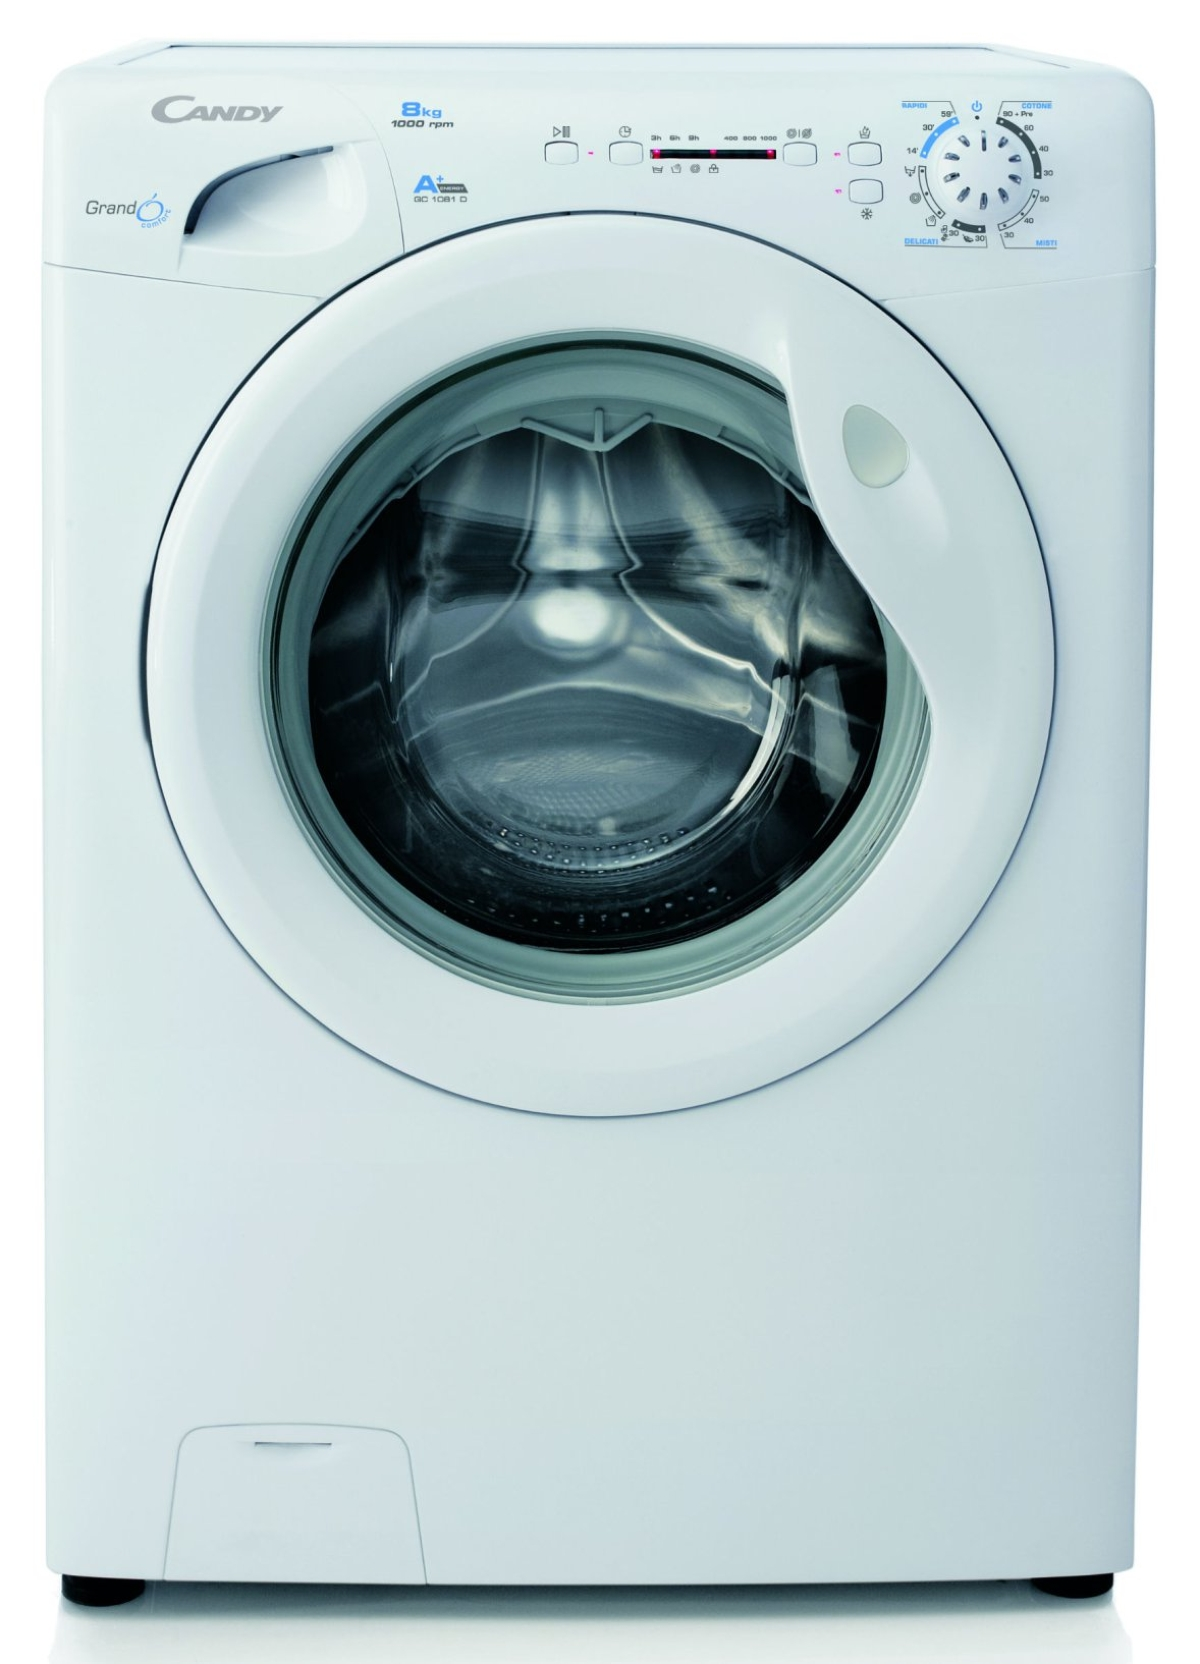 Quale lavatrice scegliere, candy GC 1081d-01